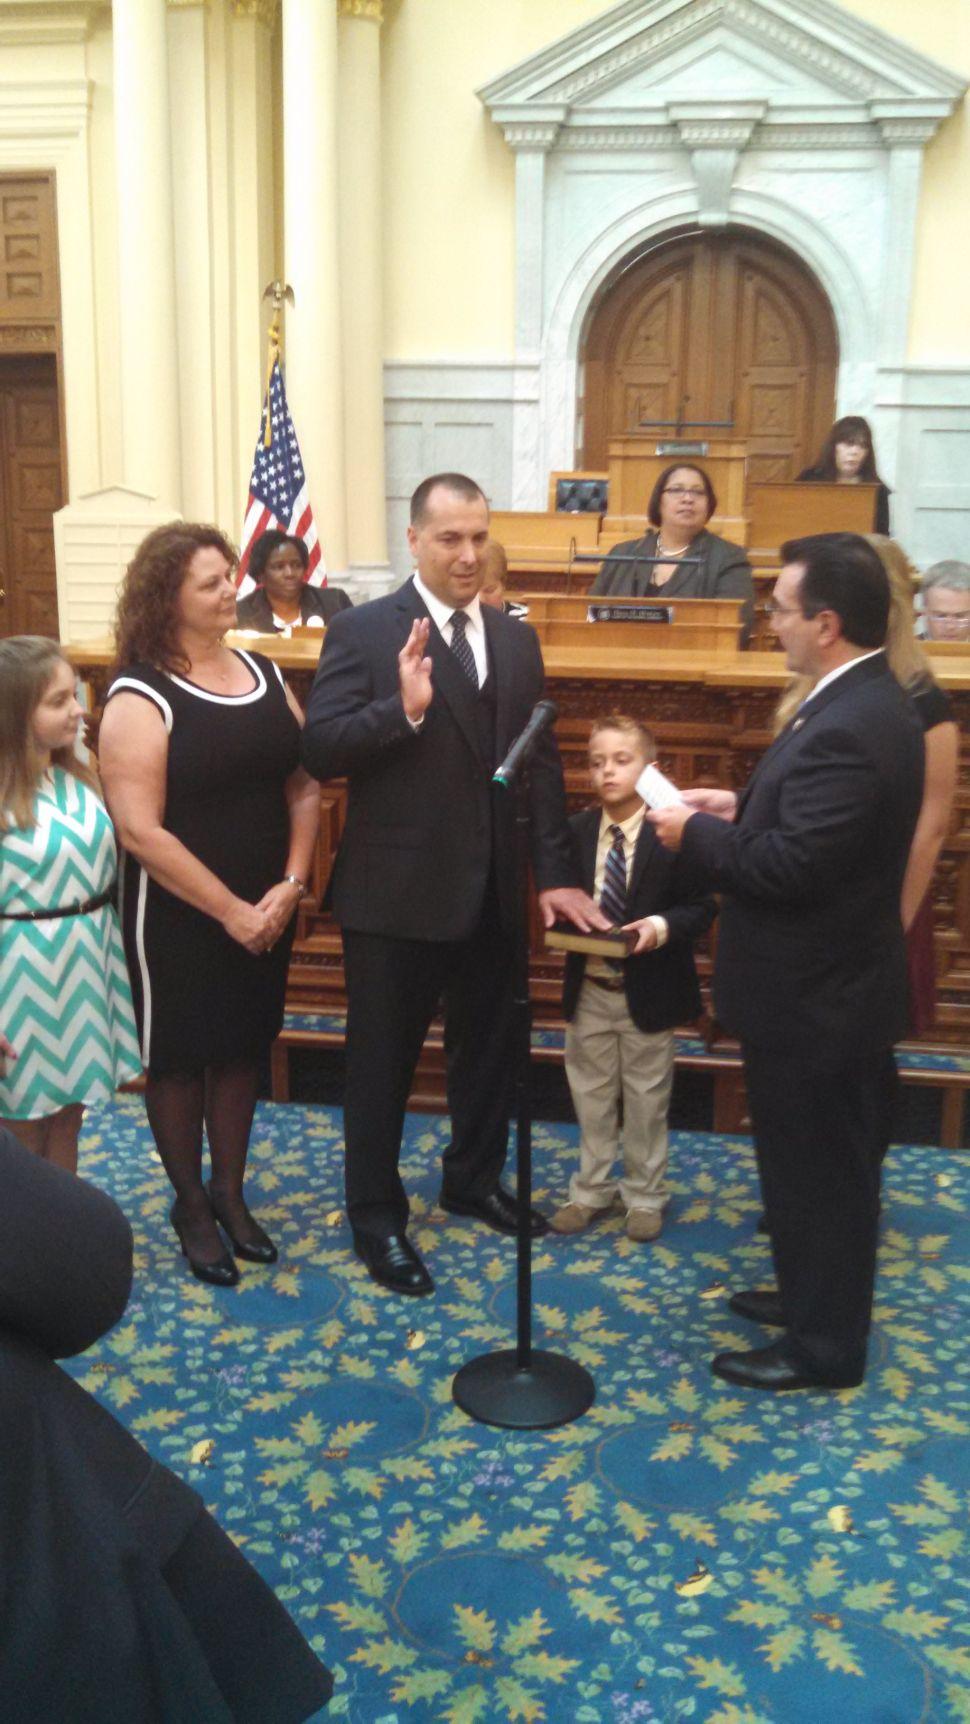 Danielsen sworn in as new LD17 assemblyman